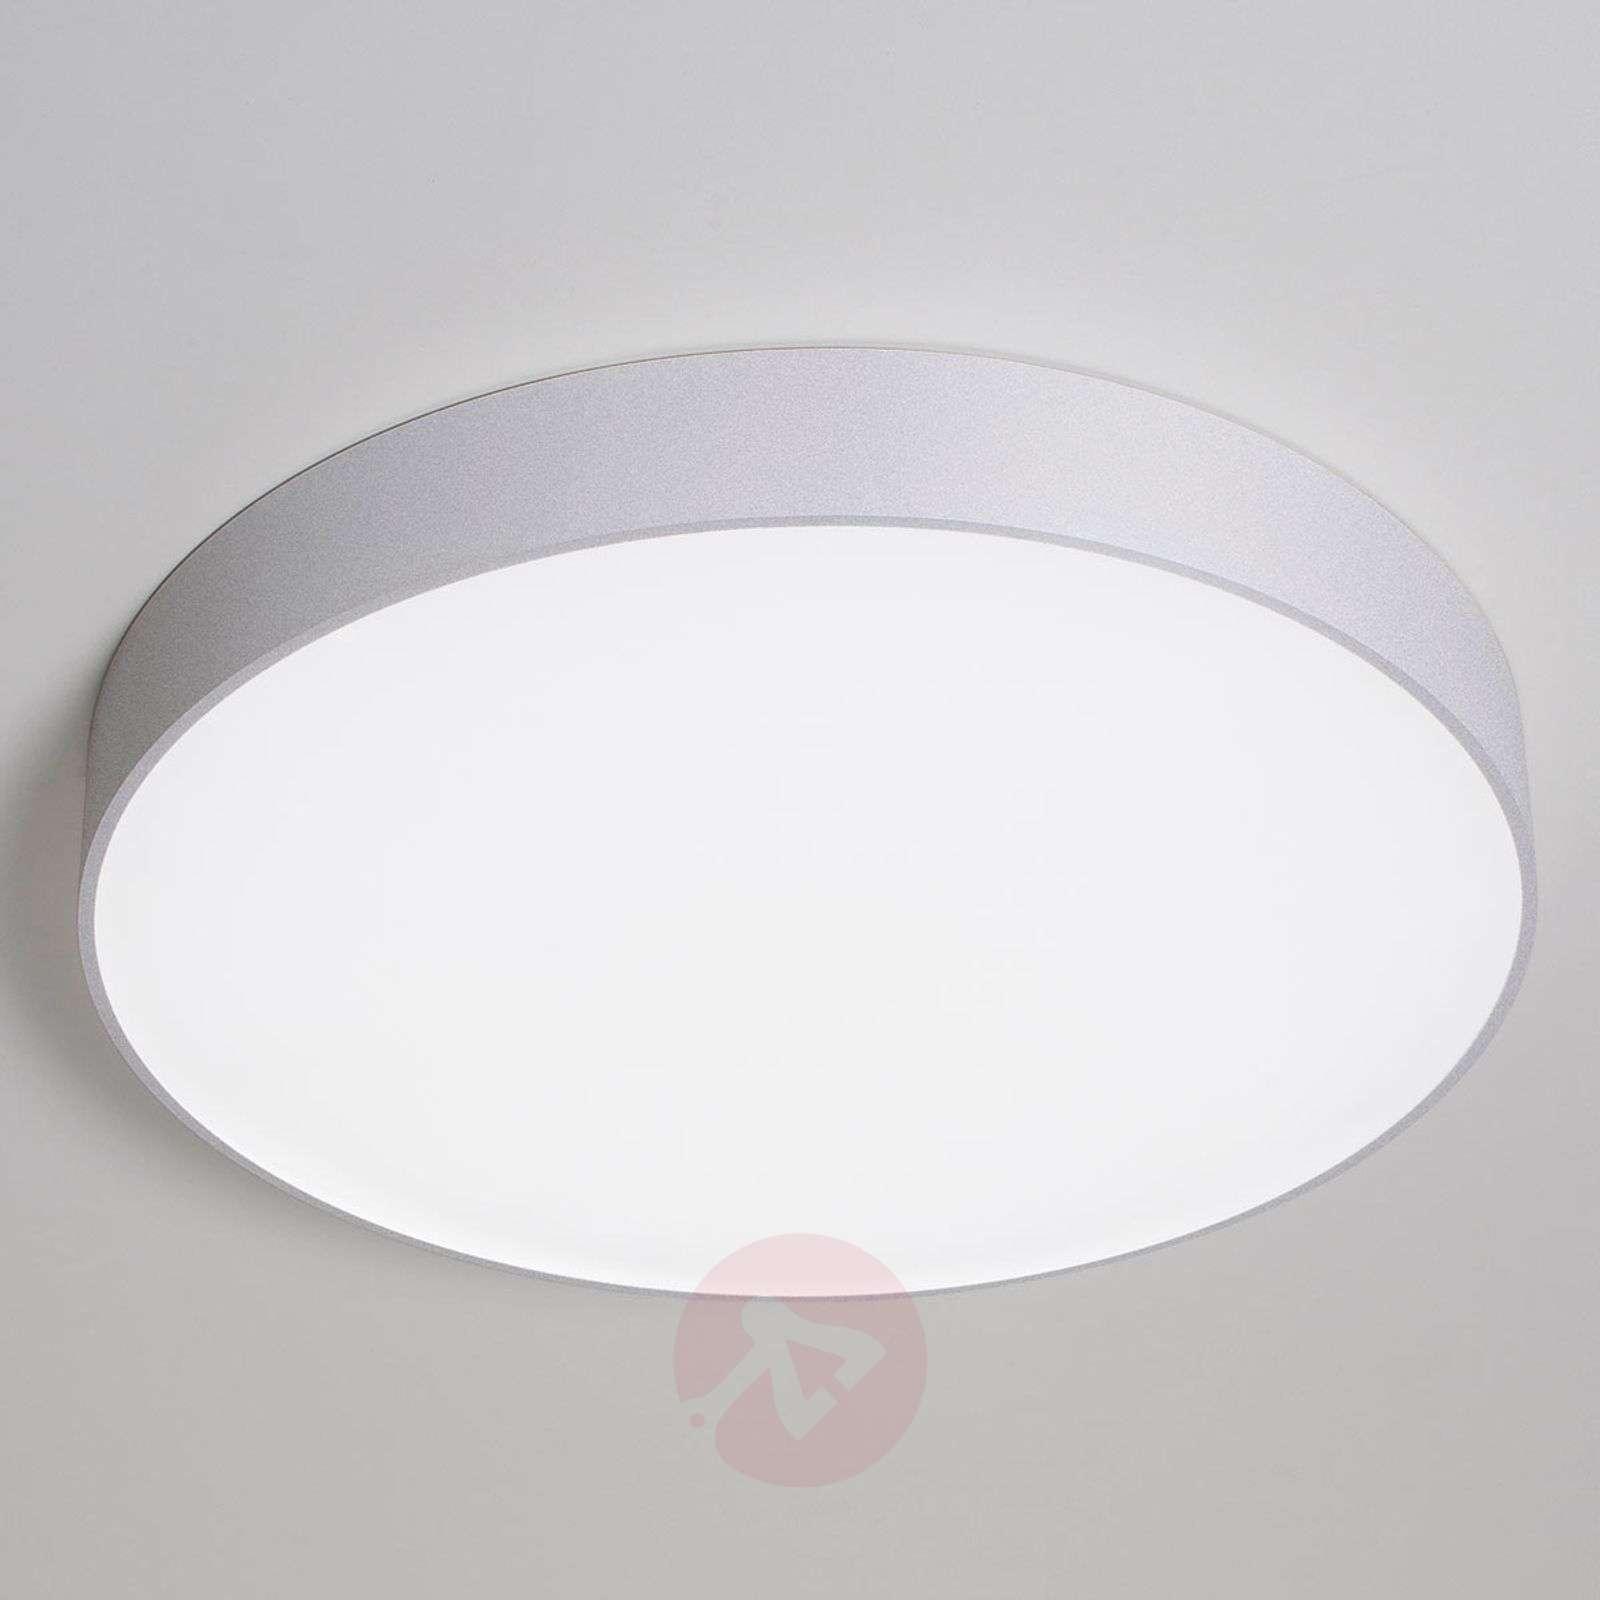 Iso LED-kattovalaisin Bado SD 60 cm, hopea-6523798X-01